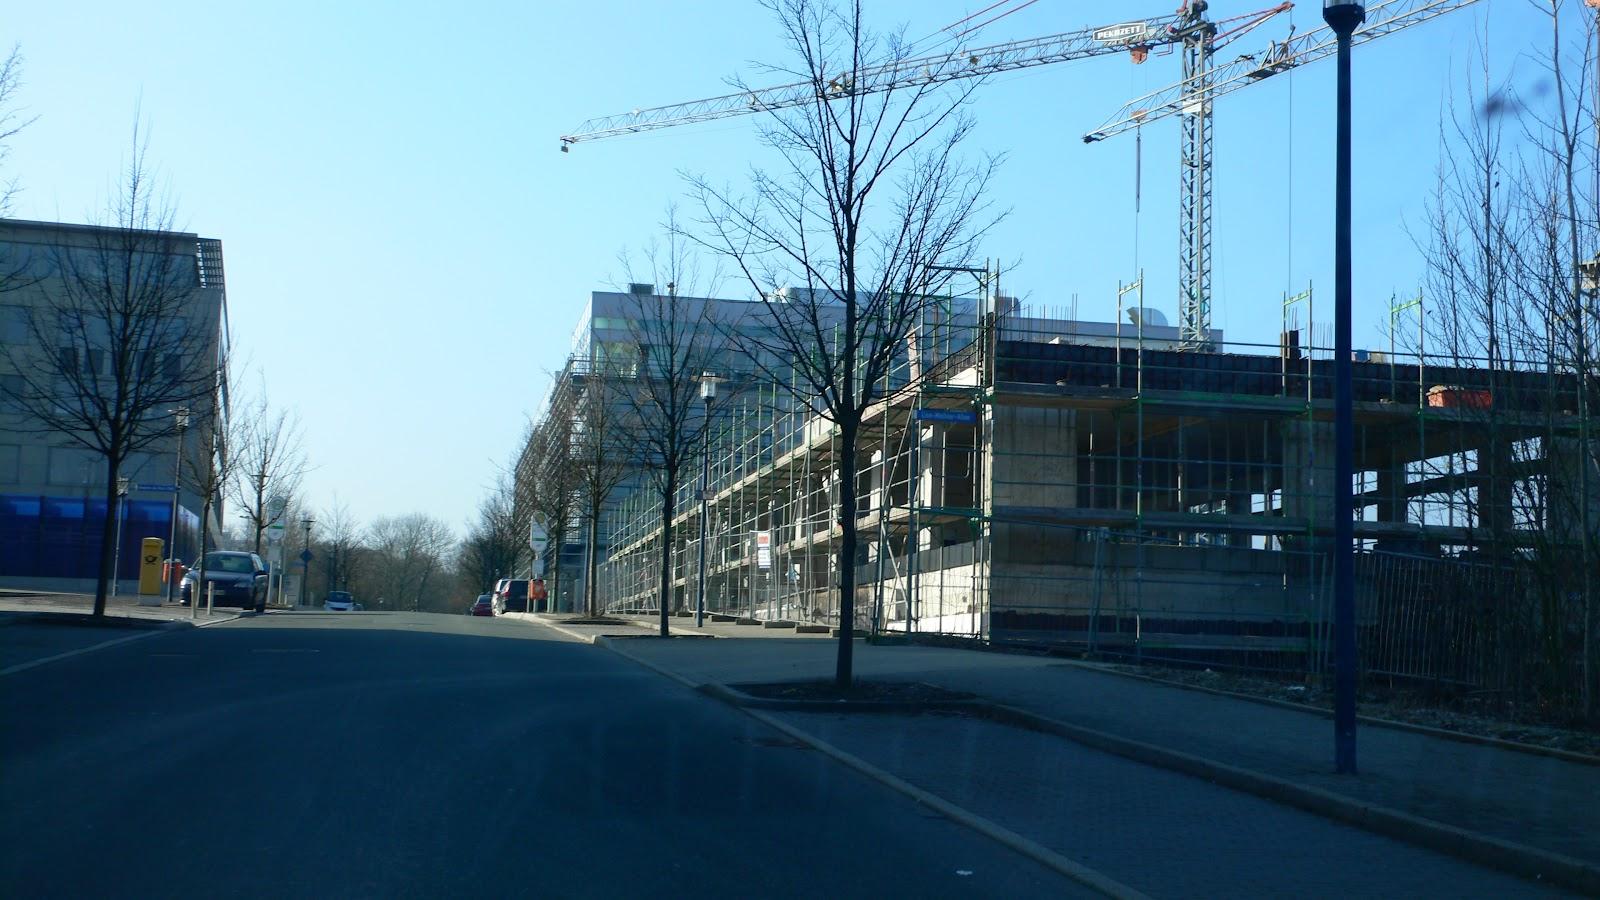 Bauprojekte bochum unternehmenszentrale zerna ingenieure gmbh fertig - Architekturburo bochum ...